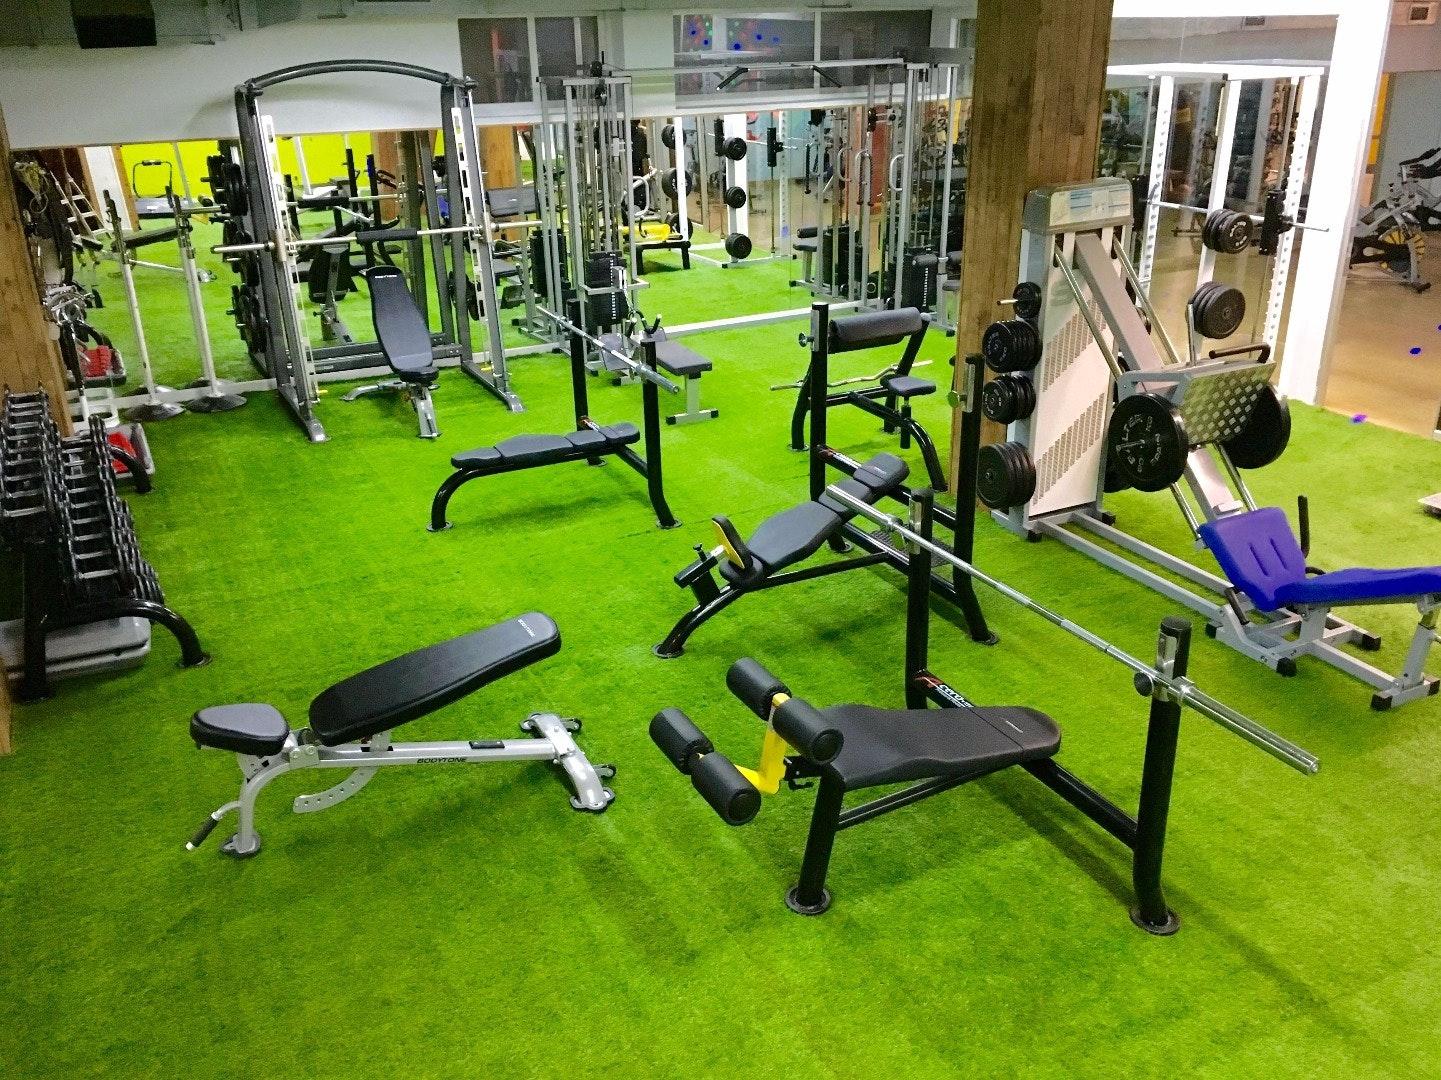 Foto 1 Oferta Gimnasio Ángel Ruiz Gym Las Rozas de Madrid - GymForLess